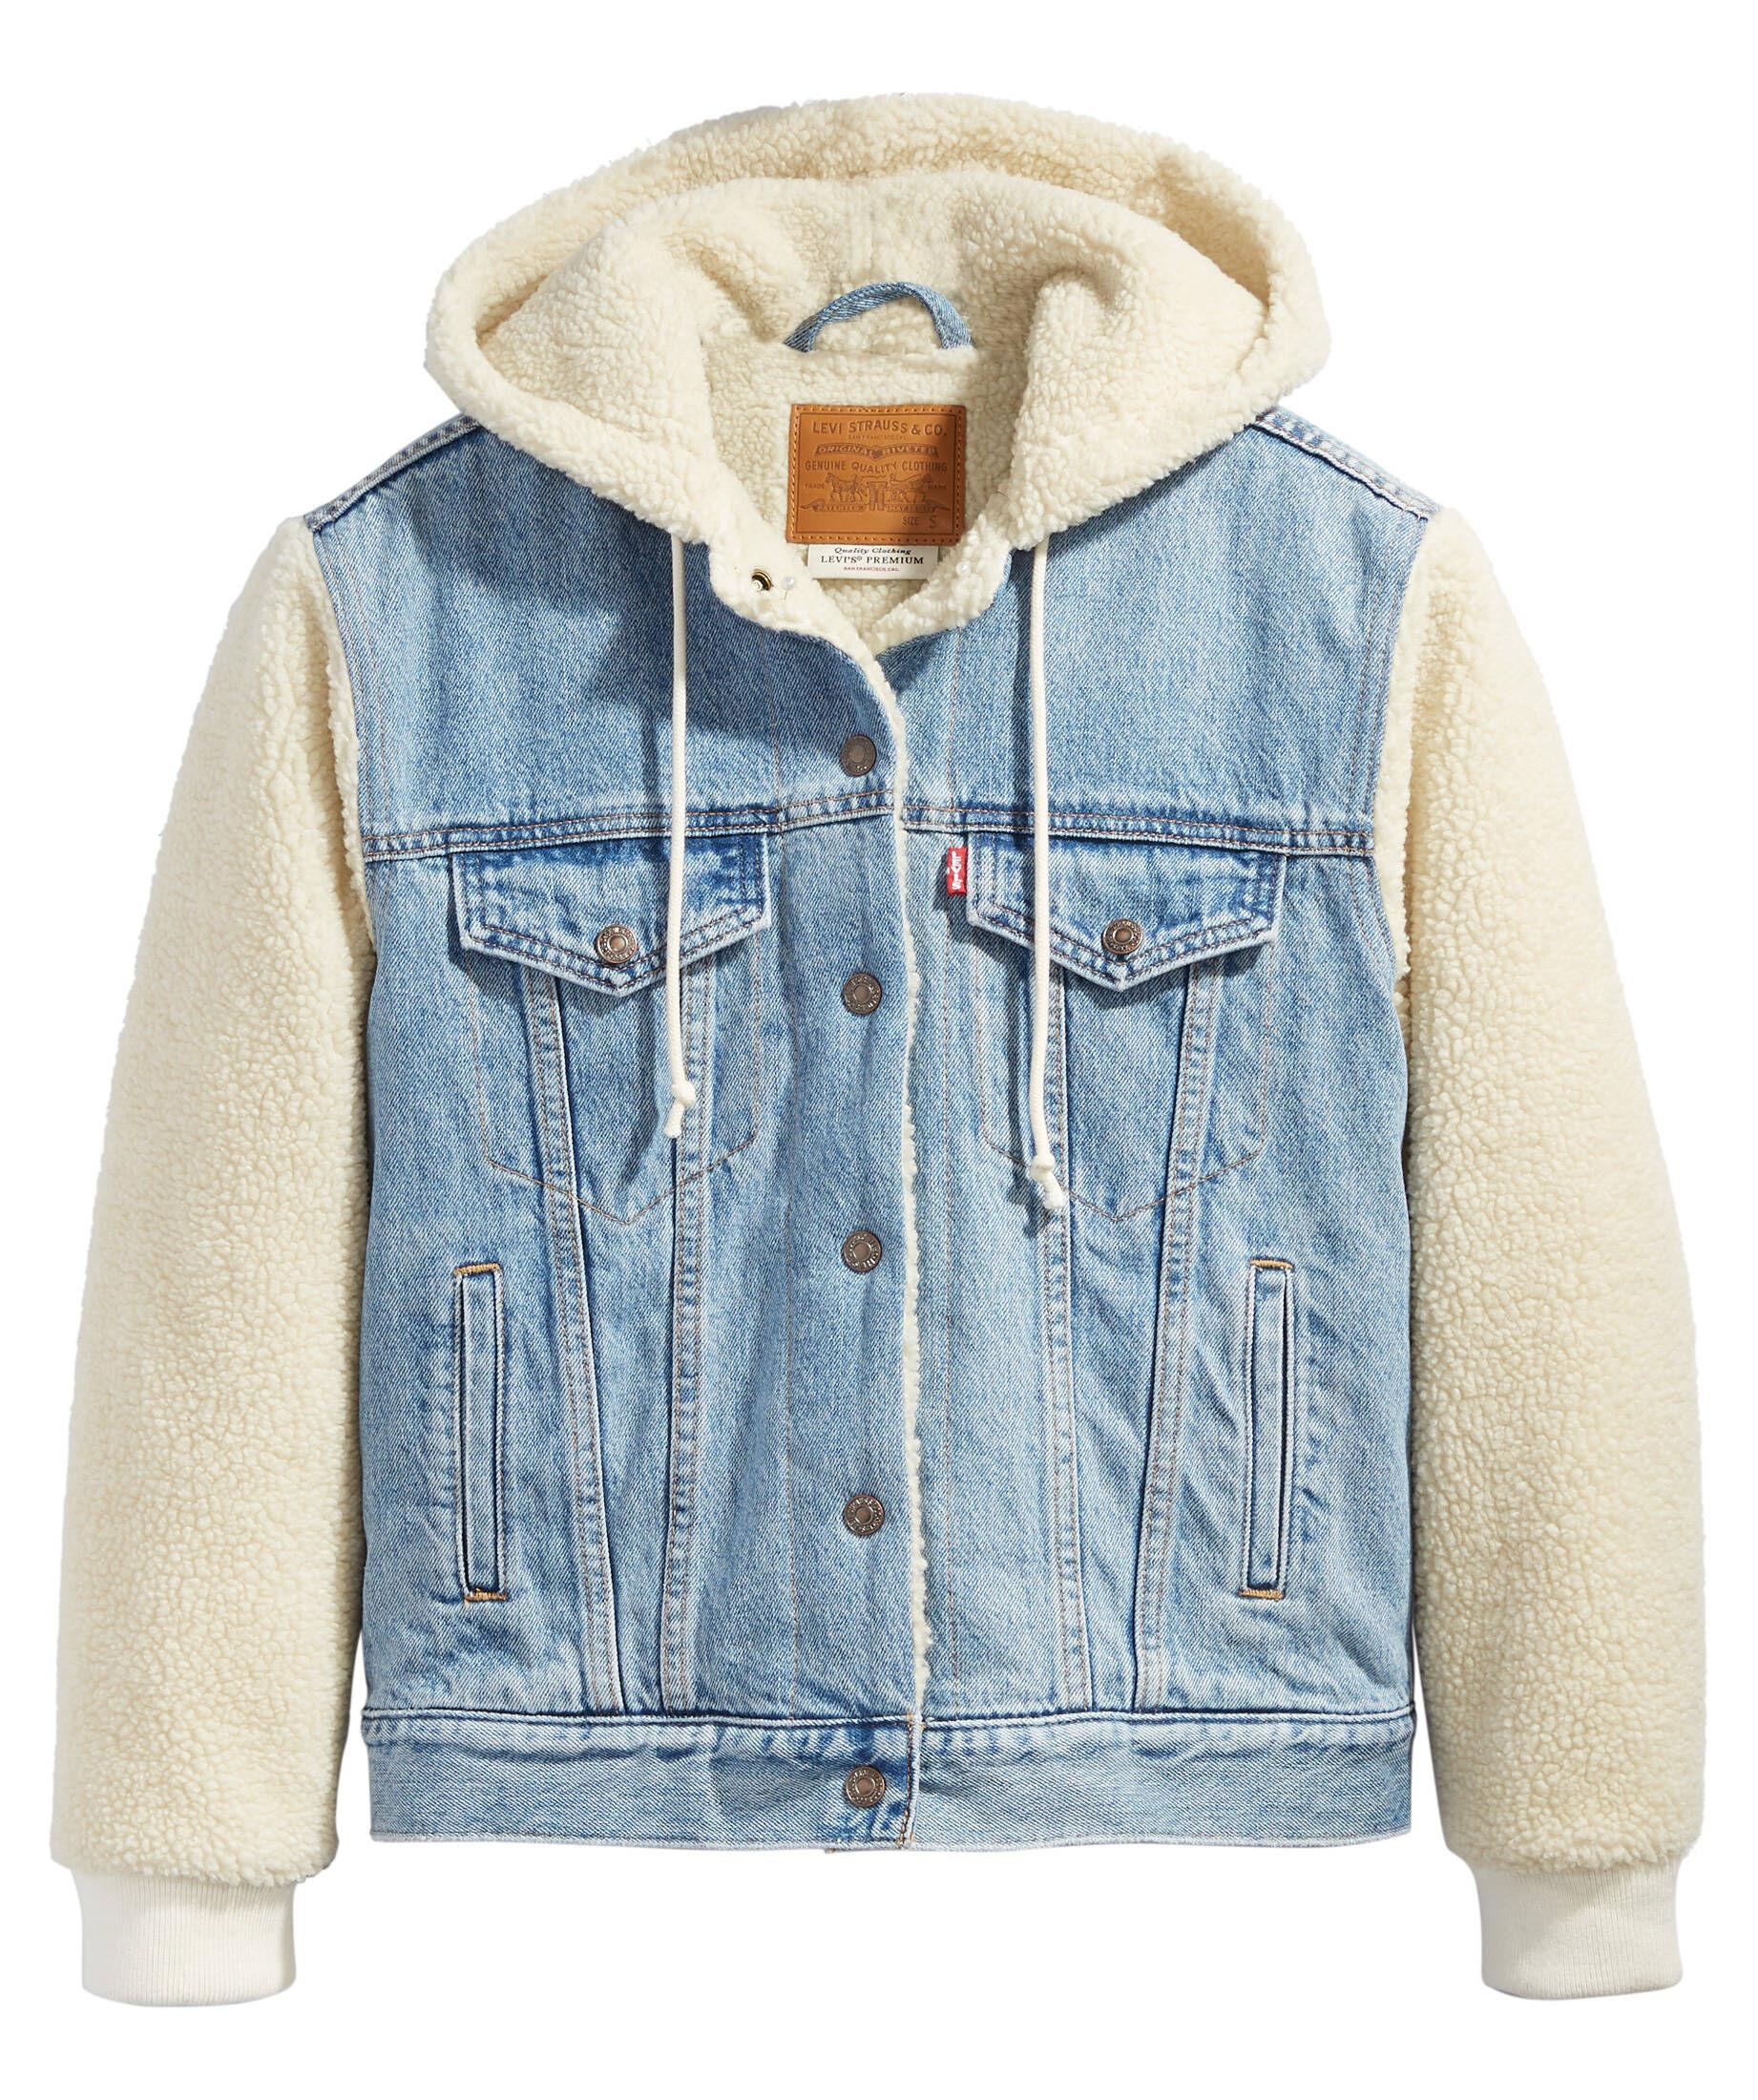 Sport Accessoires : Jacke Damen Reduziert Kaufen,Jeansjacke